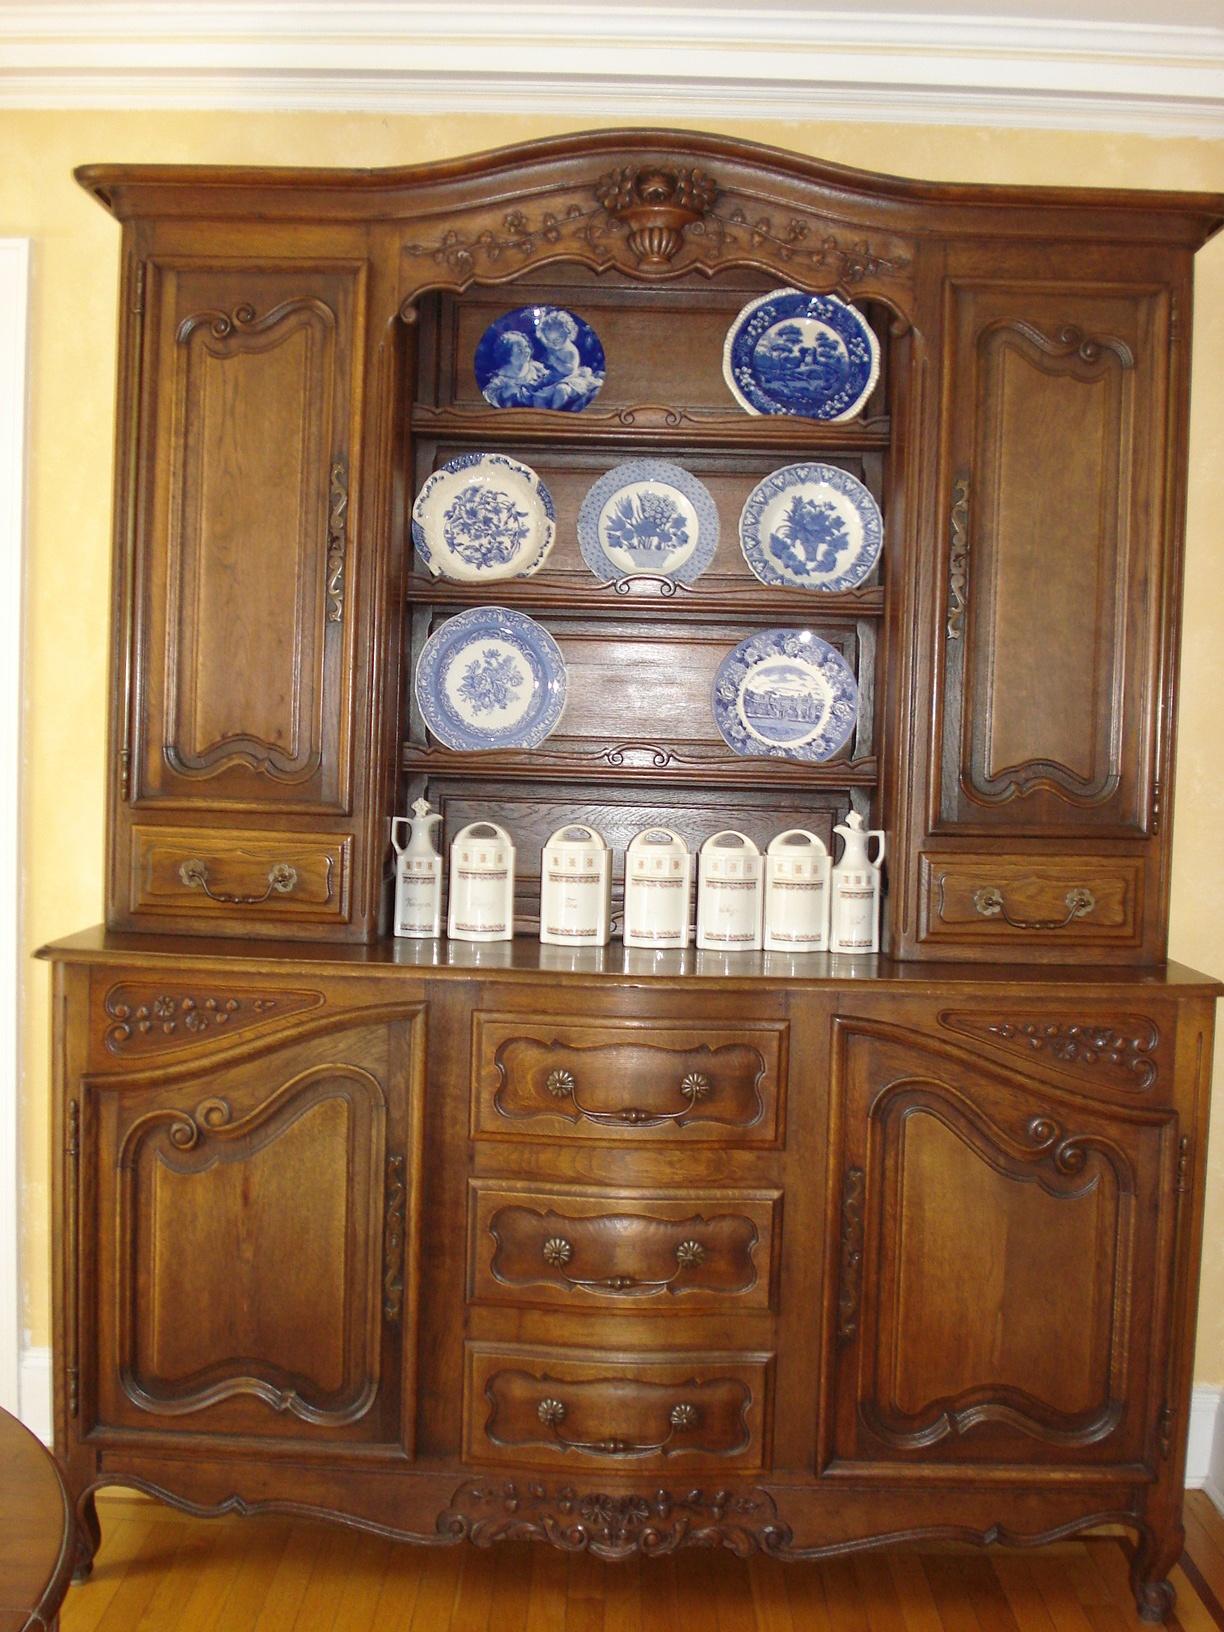 Antique Dutch Hutch Antique Appraisal Instappraisal